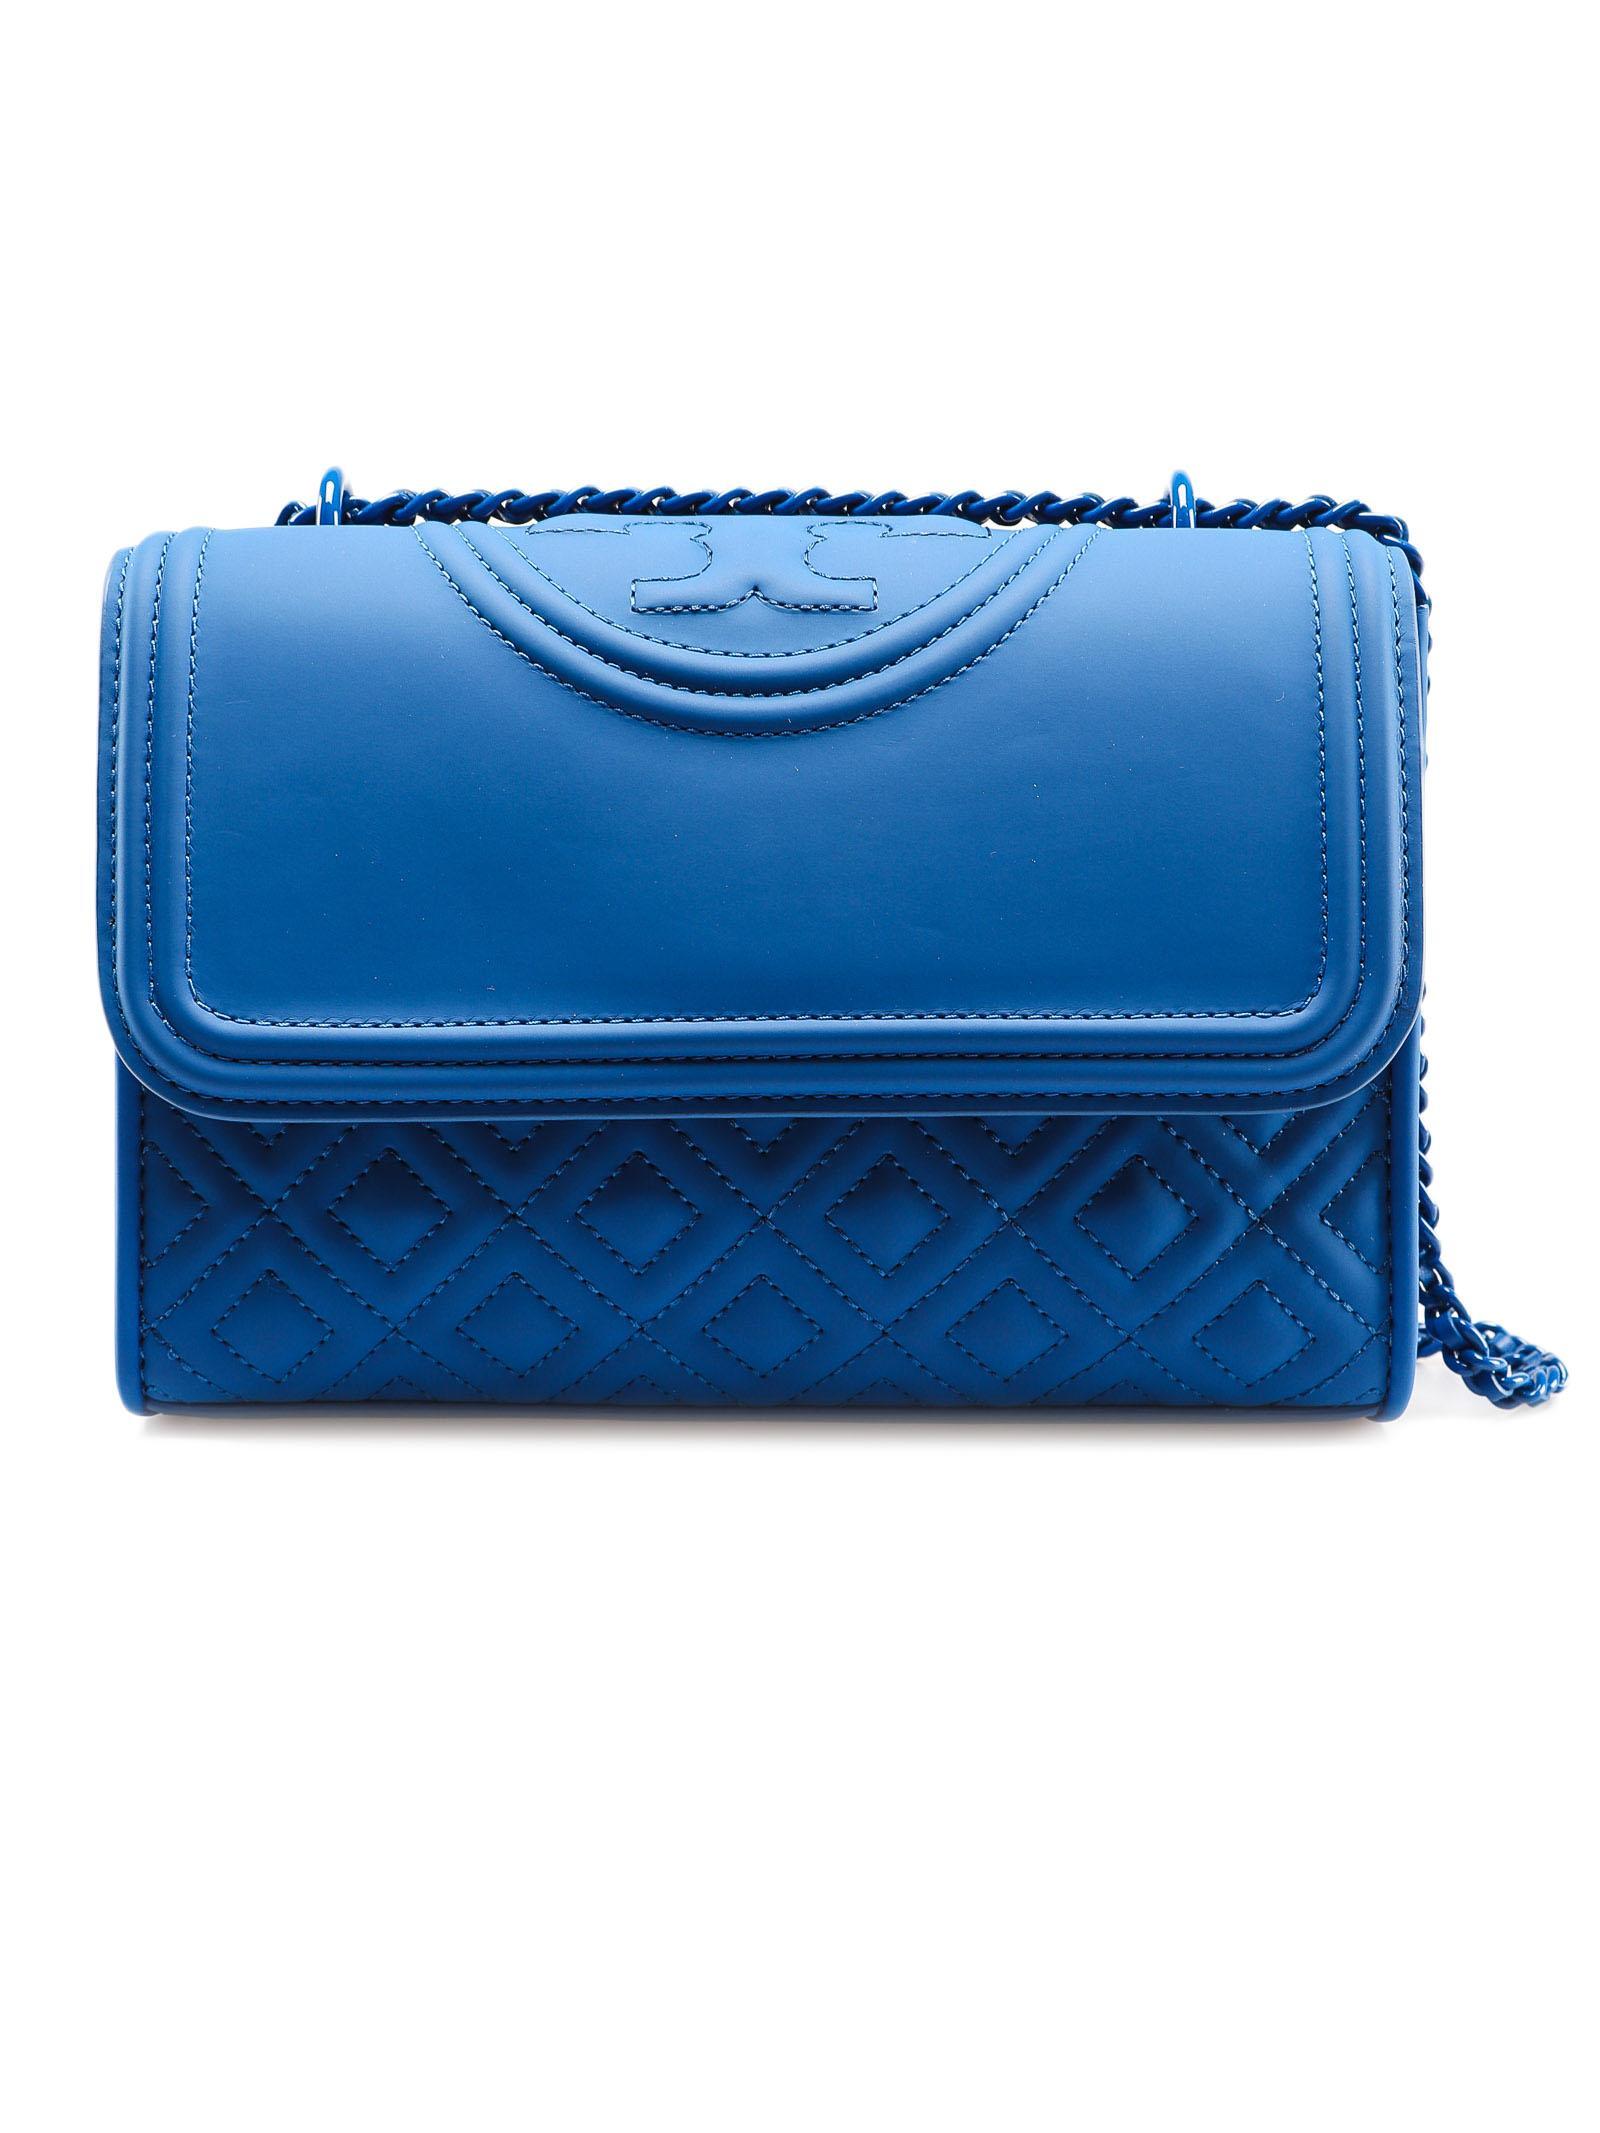 fdd20f71900 Tory Burch Fleming Conv.bag in Blue - Lyst